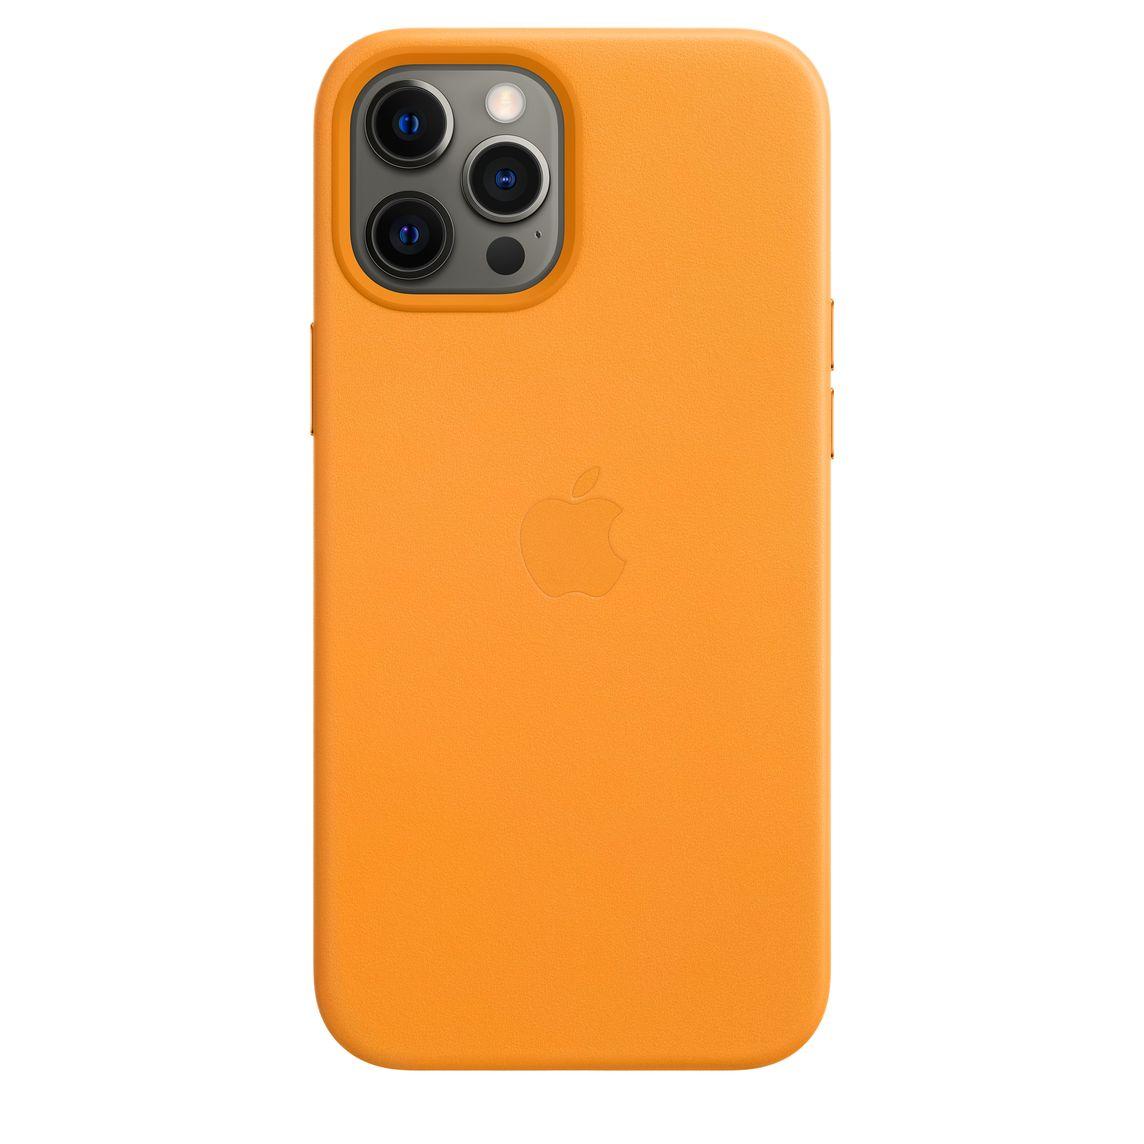 Custodia MagSafe in pelle per iPhone 12 Pro Max - Sole di California